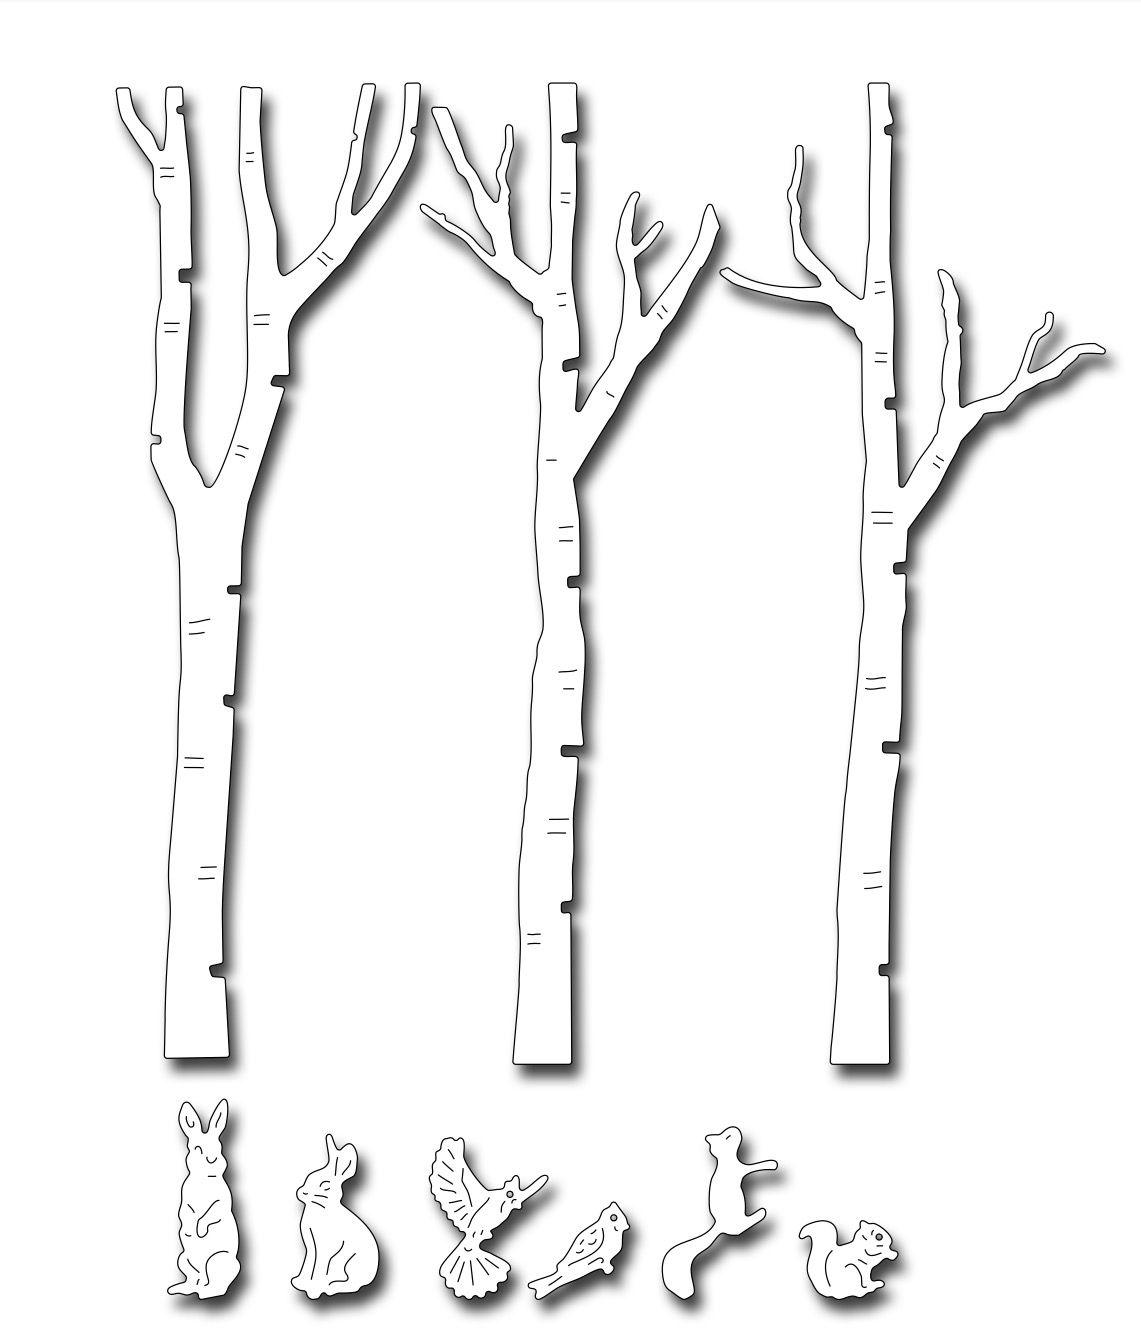 **PRE-ORDER** Frantic Stamper Precision Die - Birch Tree Forest